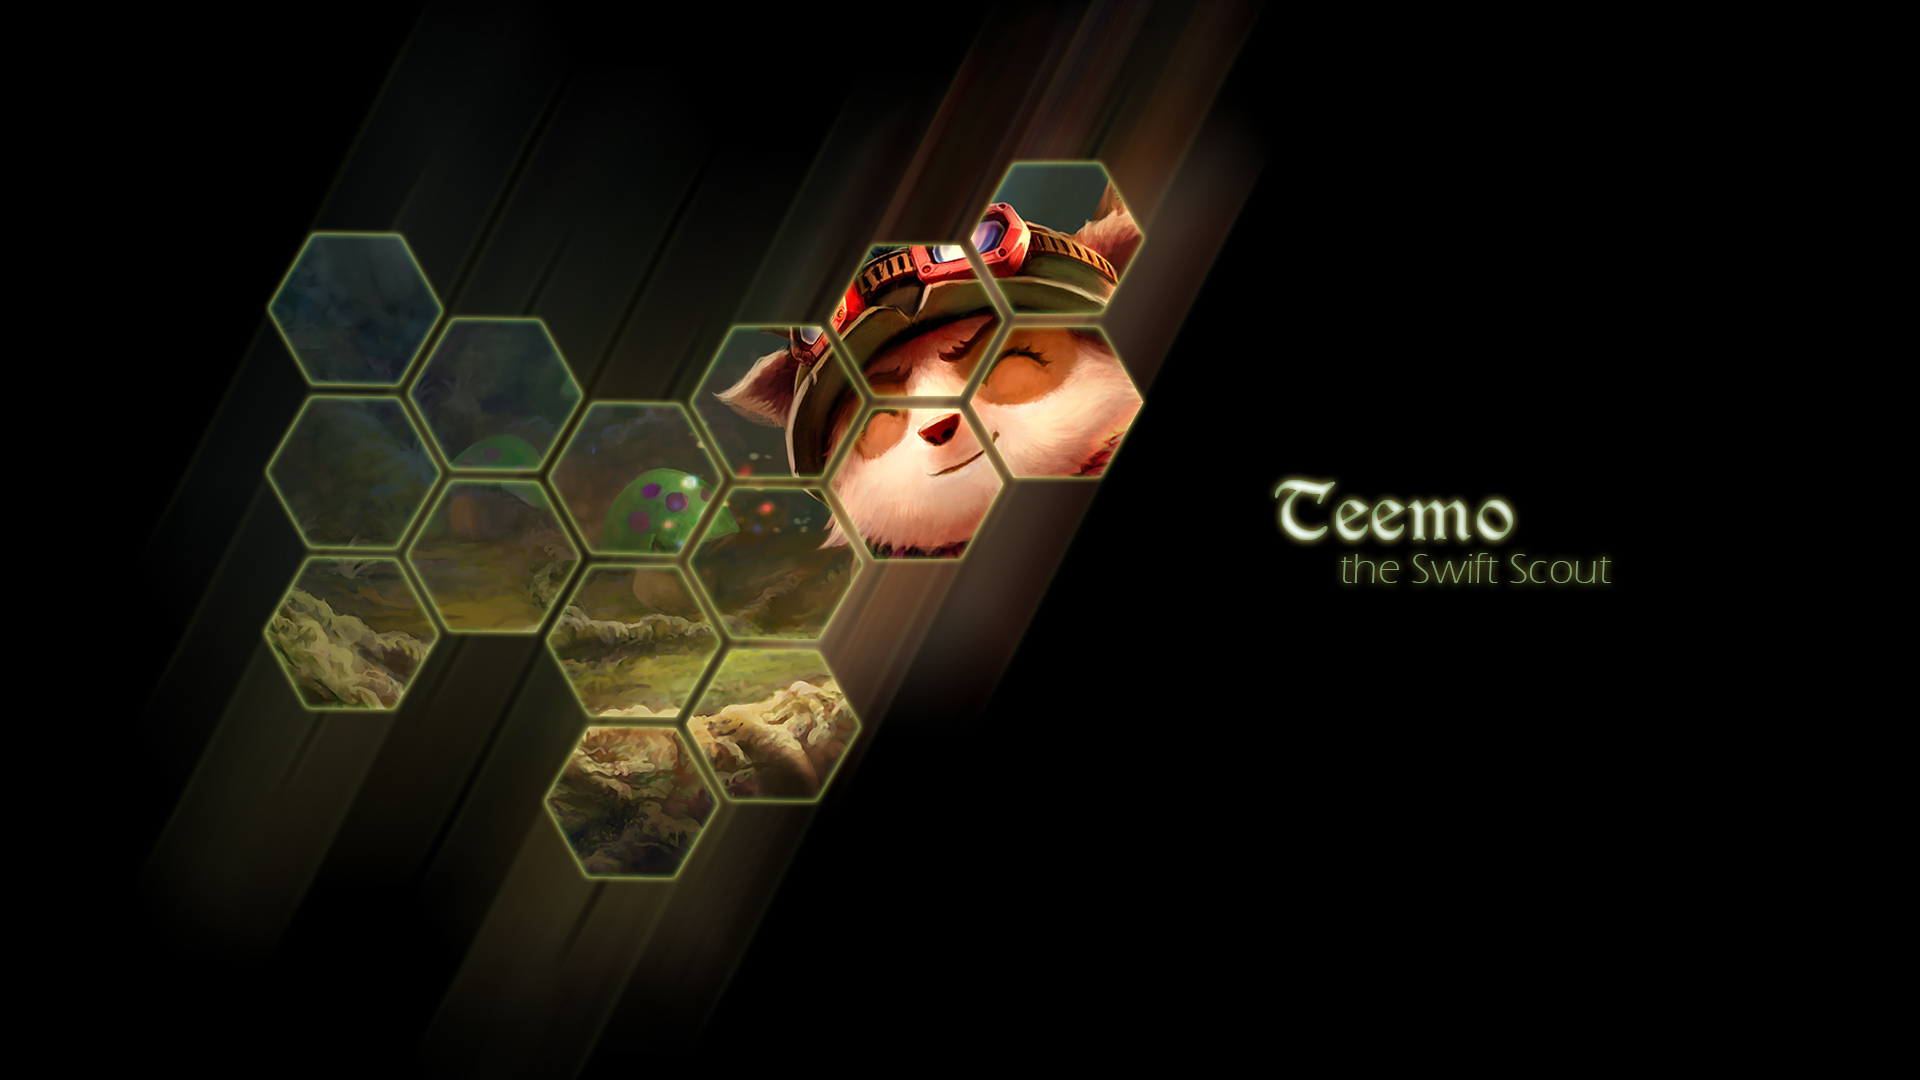 [49+] League of Legends 1080p Wallpaper on WallpaperSafari